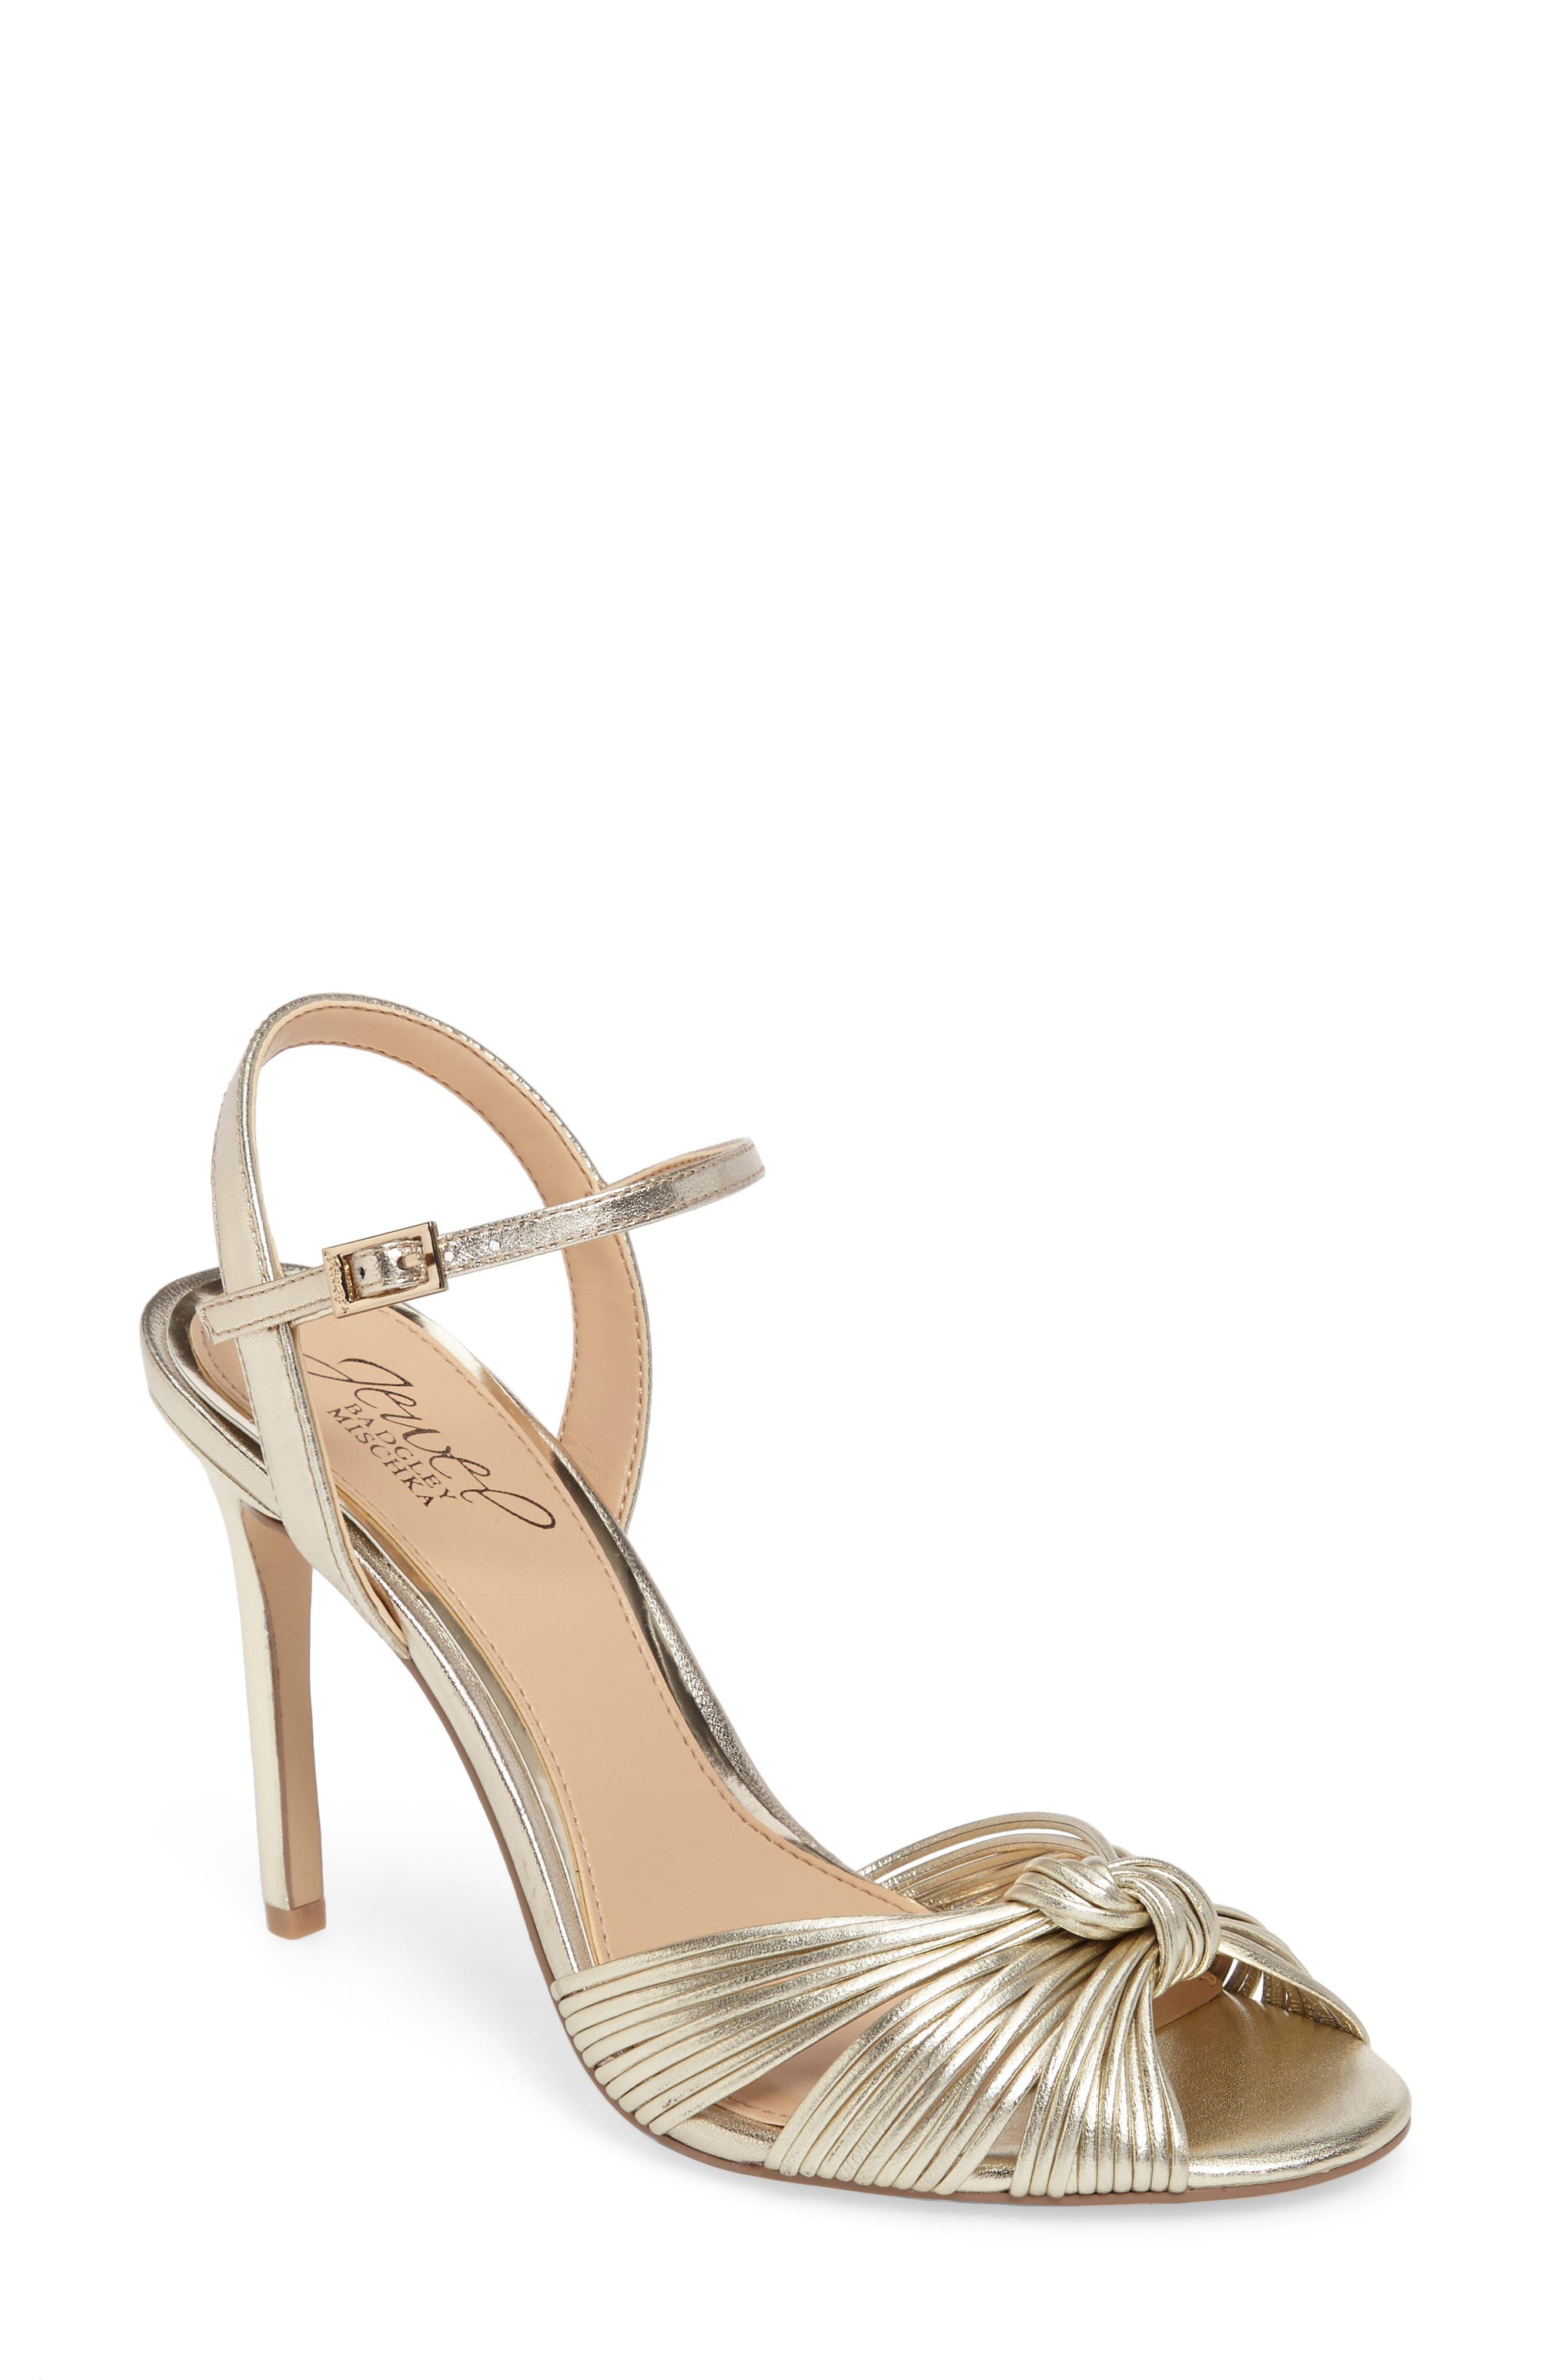 Main Image - Jewel Badgley Mischka Lady Ankle Strap Sandal (Women)